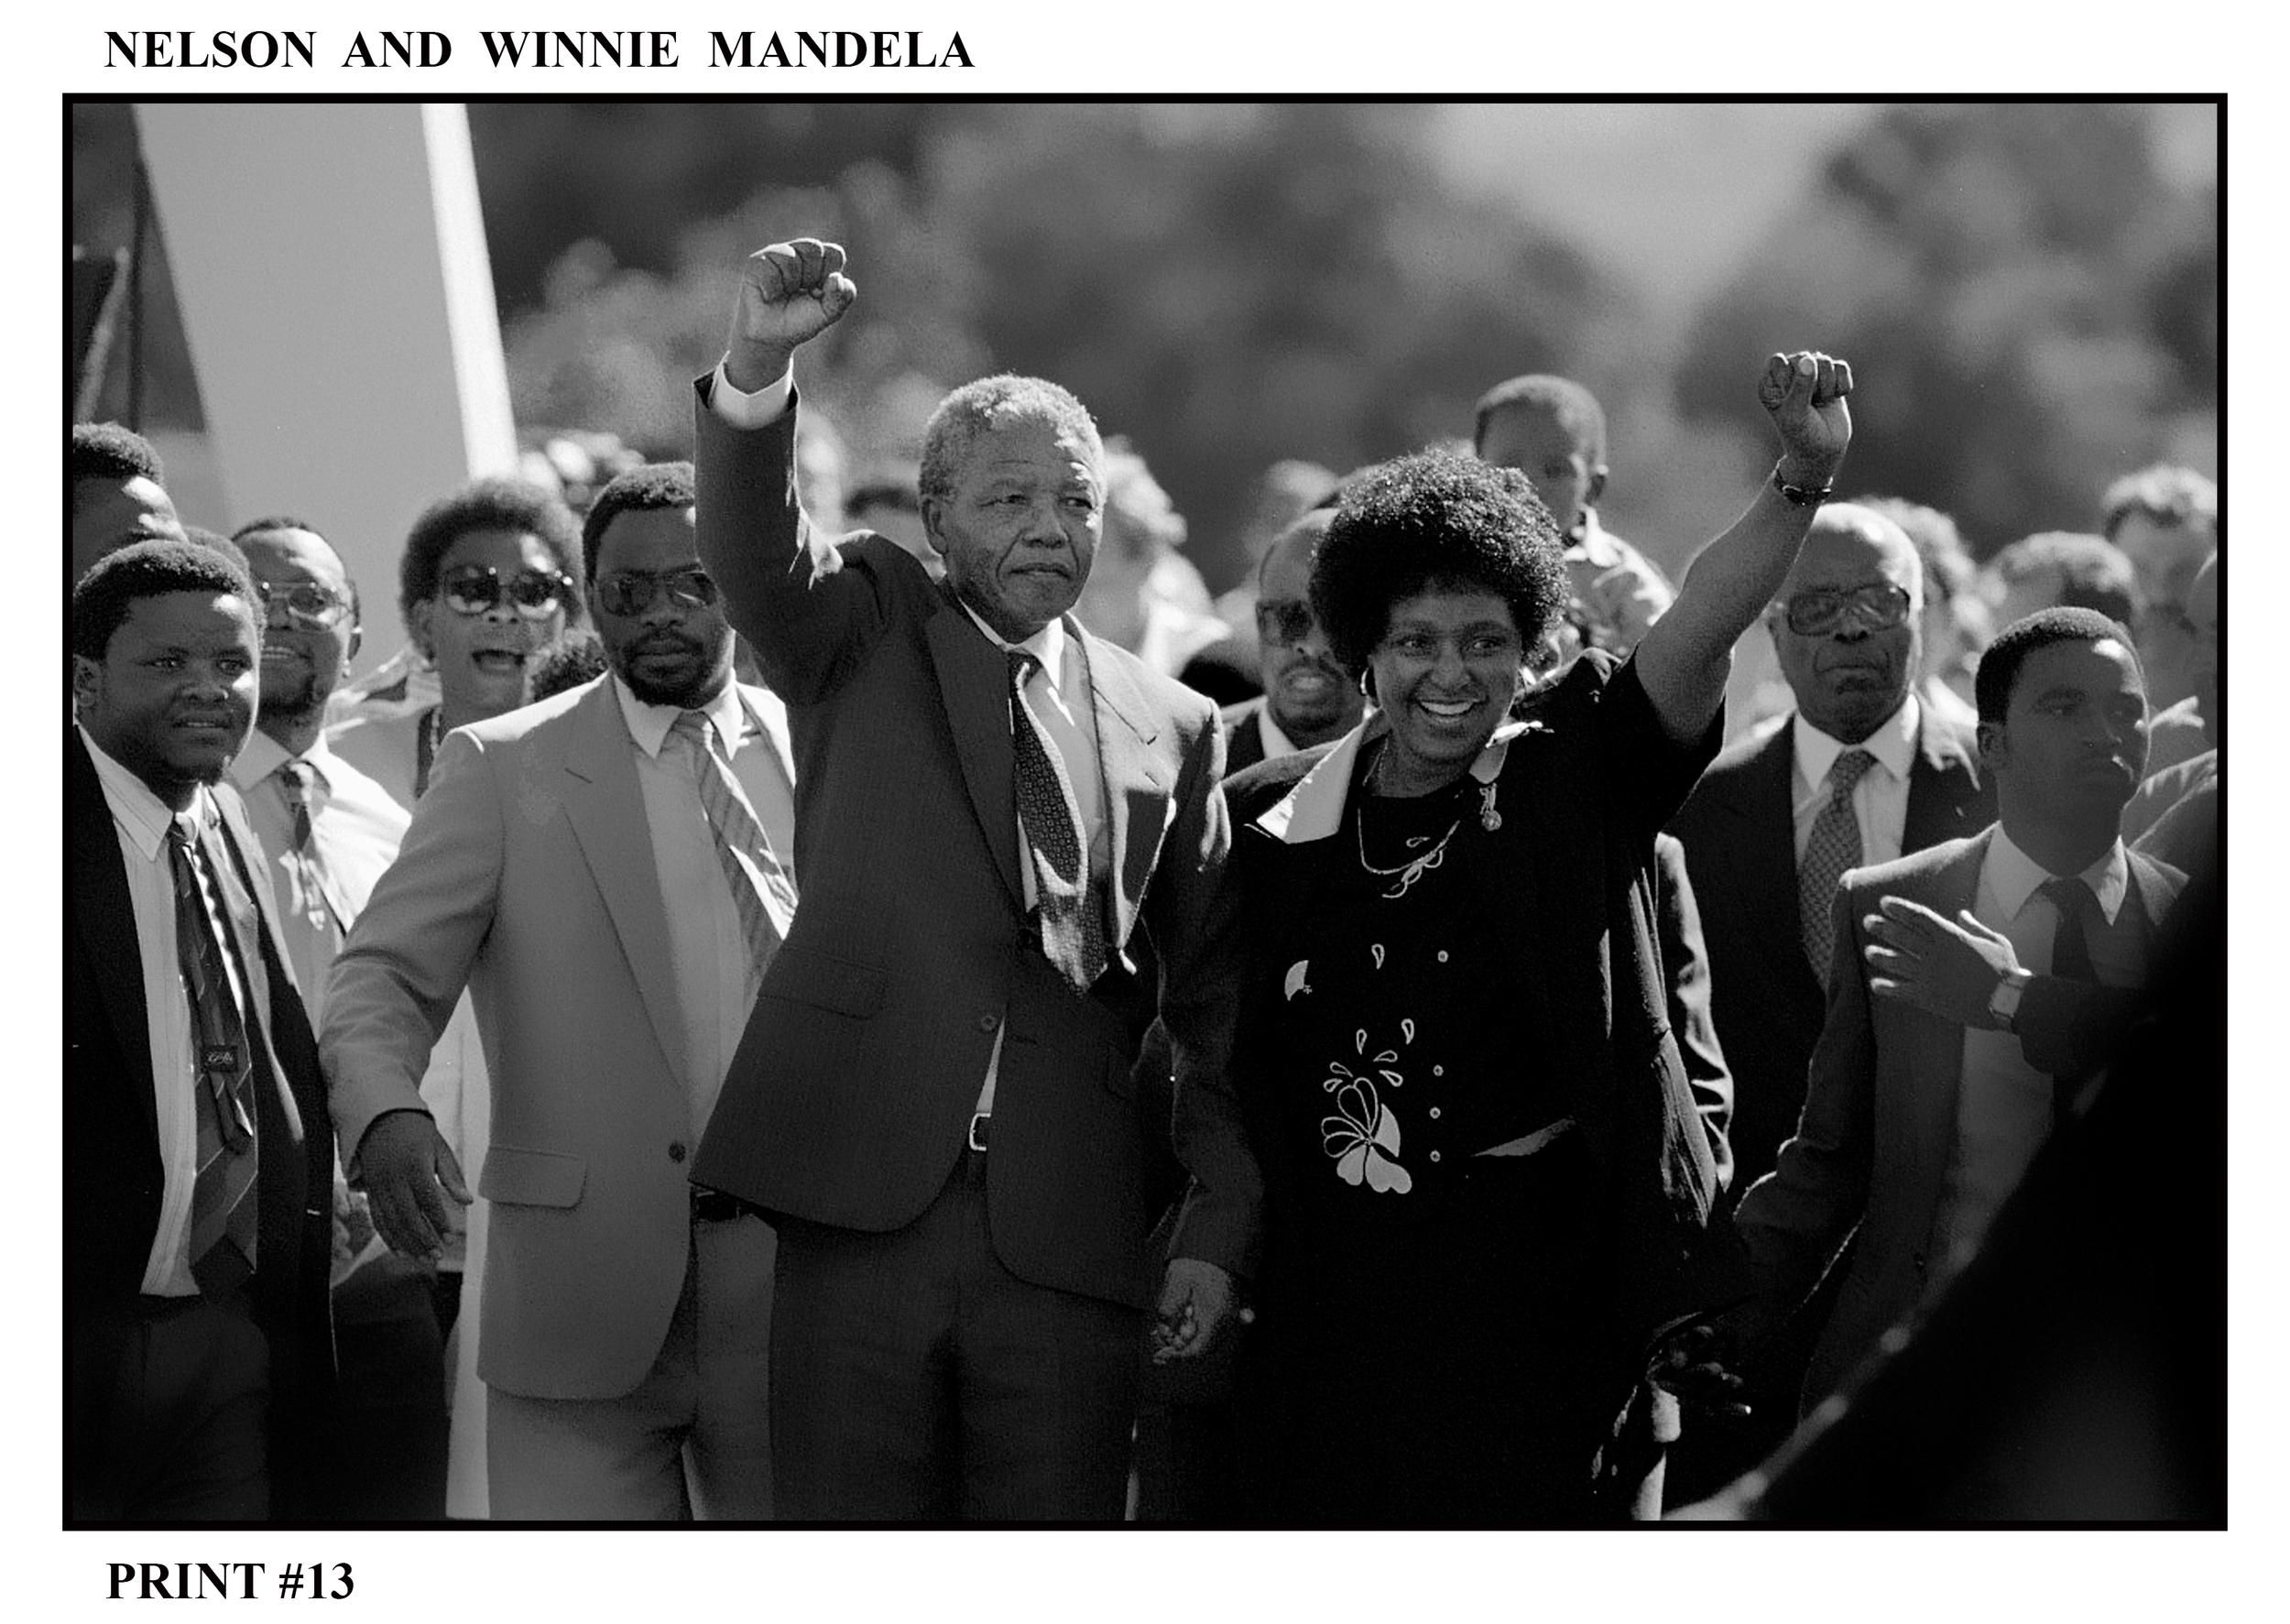 013NELSON AND WINNIE MANDELA copy.jpg